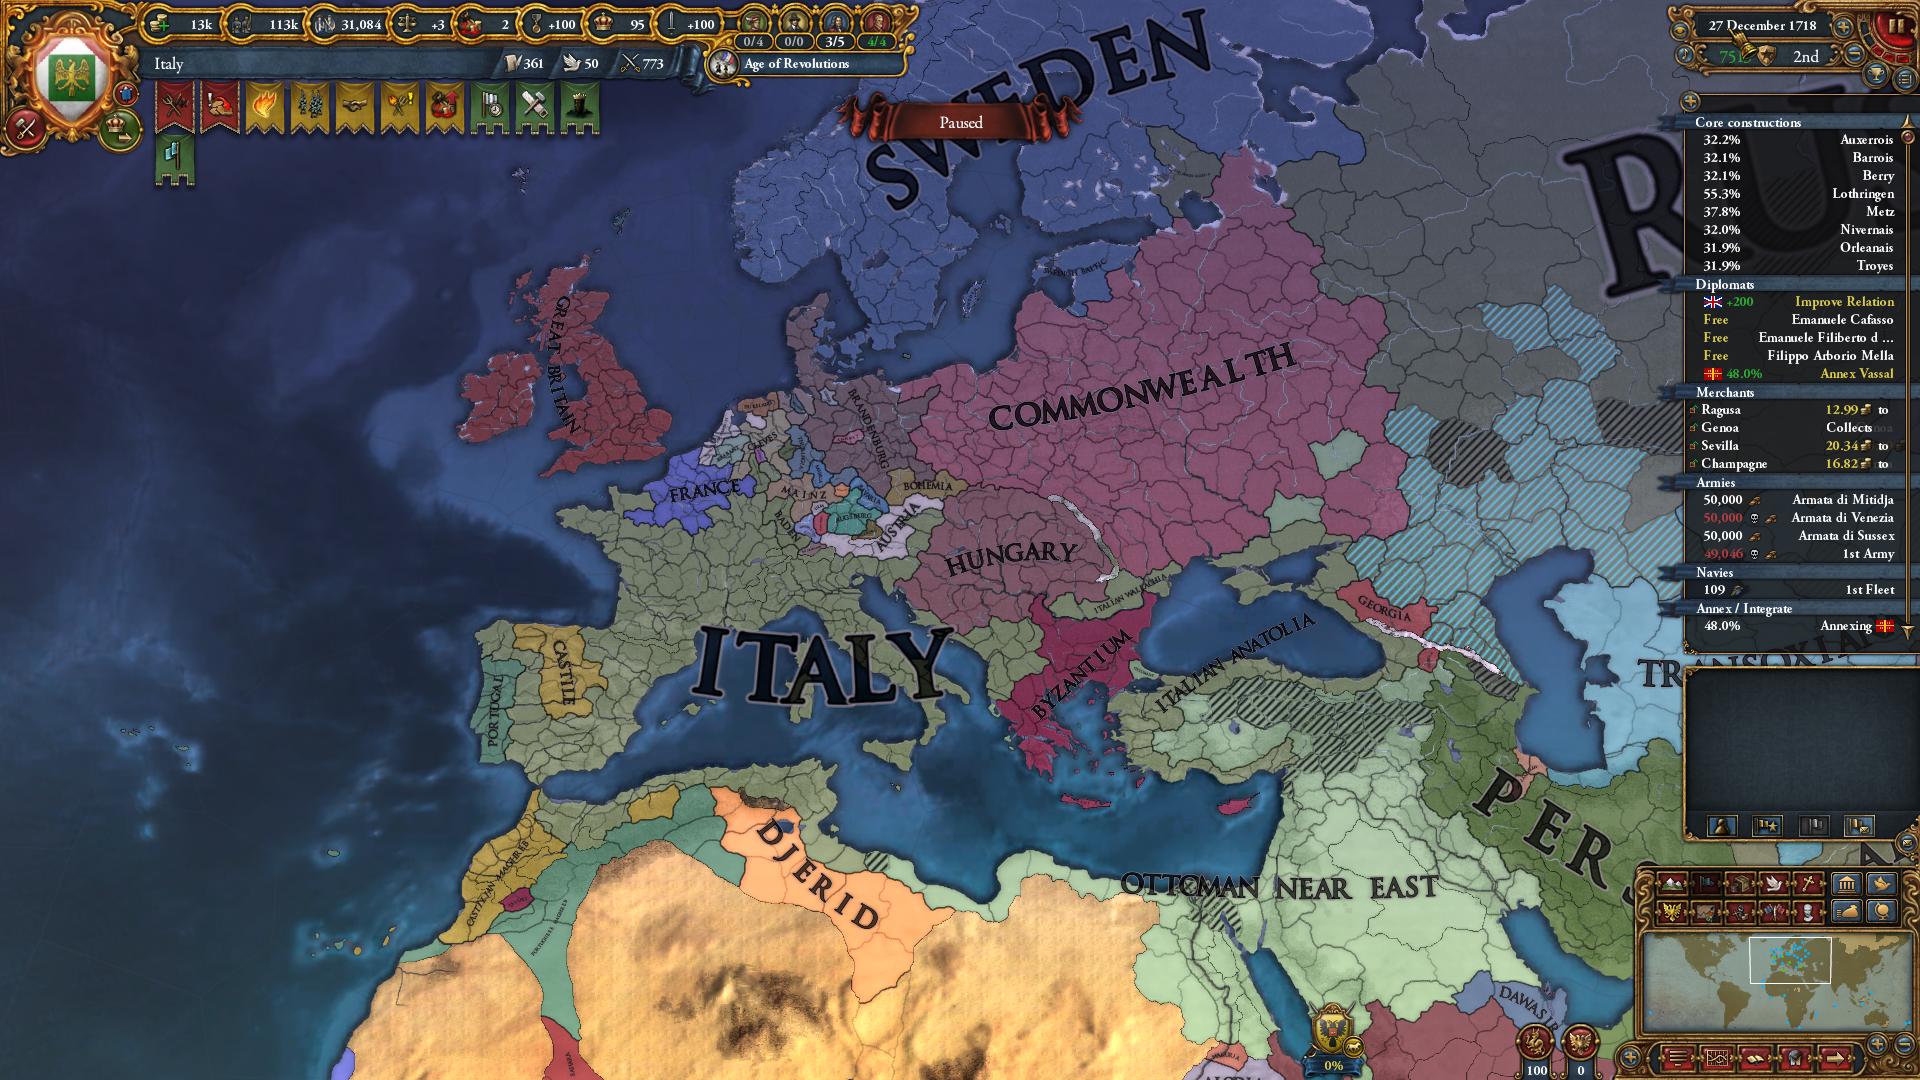 Eu4 how to get pu to integrate vassals